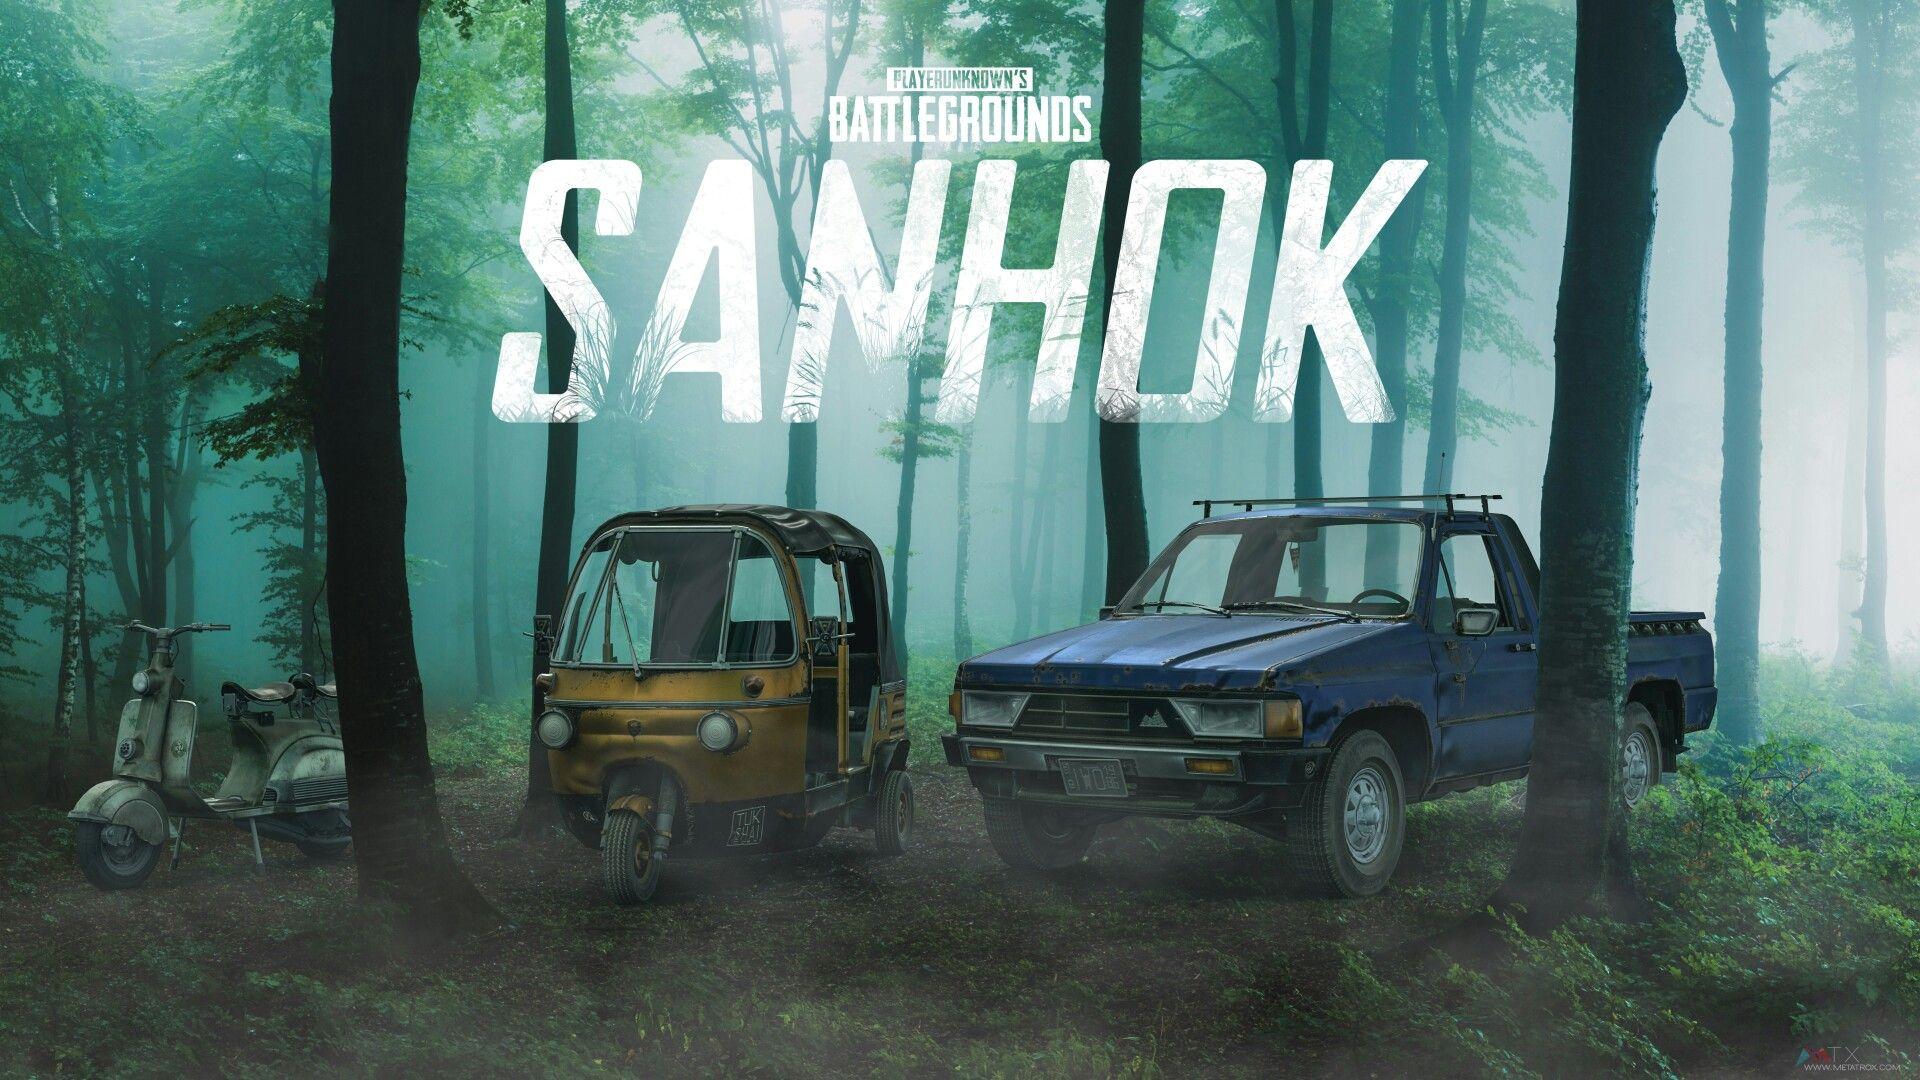 Pubg Sanhok Hd Wallpapers For Mobile Hd Wallpapers For Pc Wallpaper